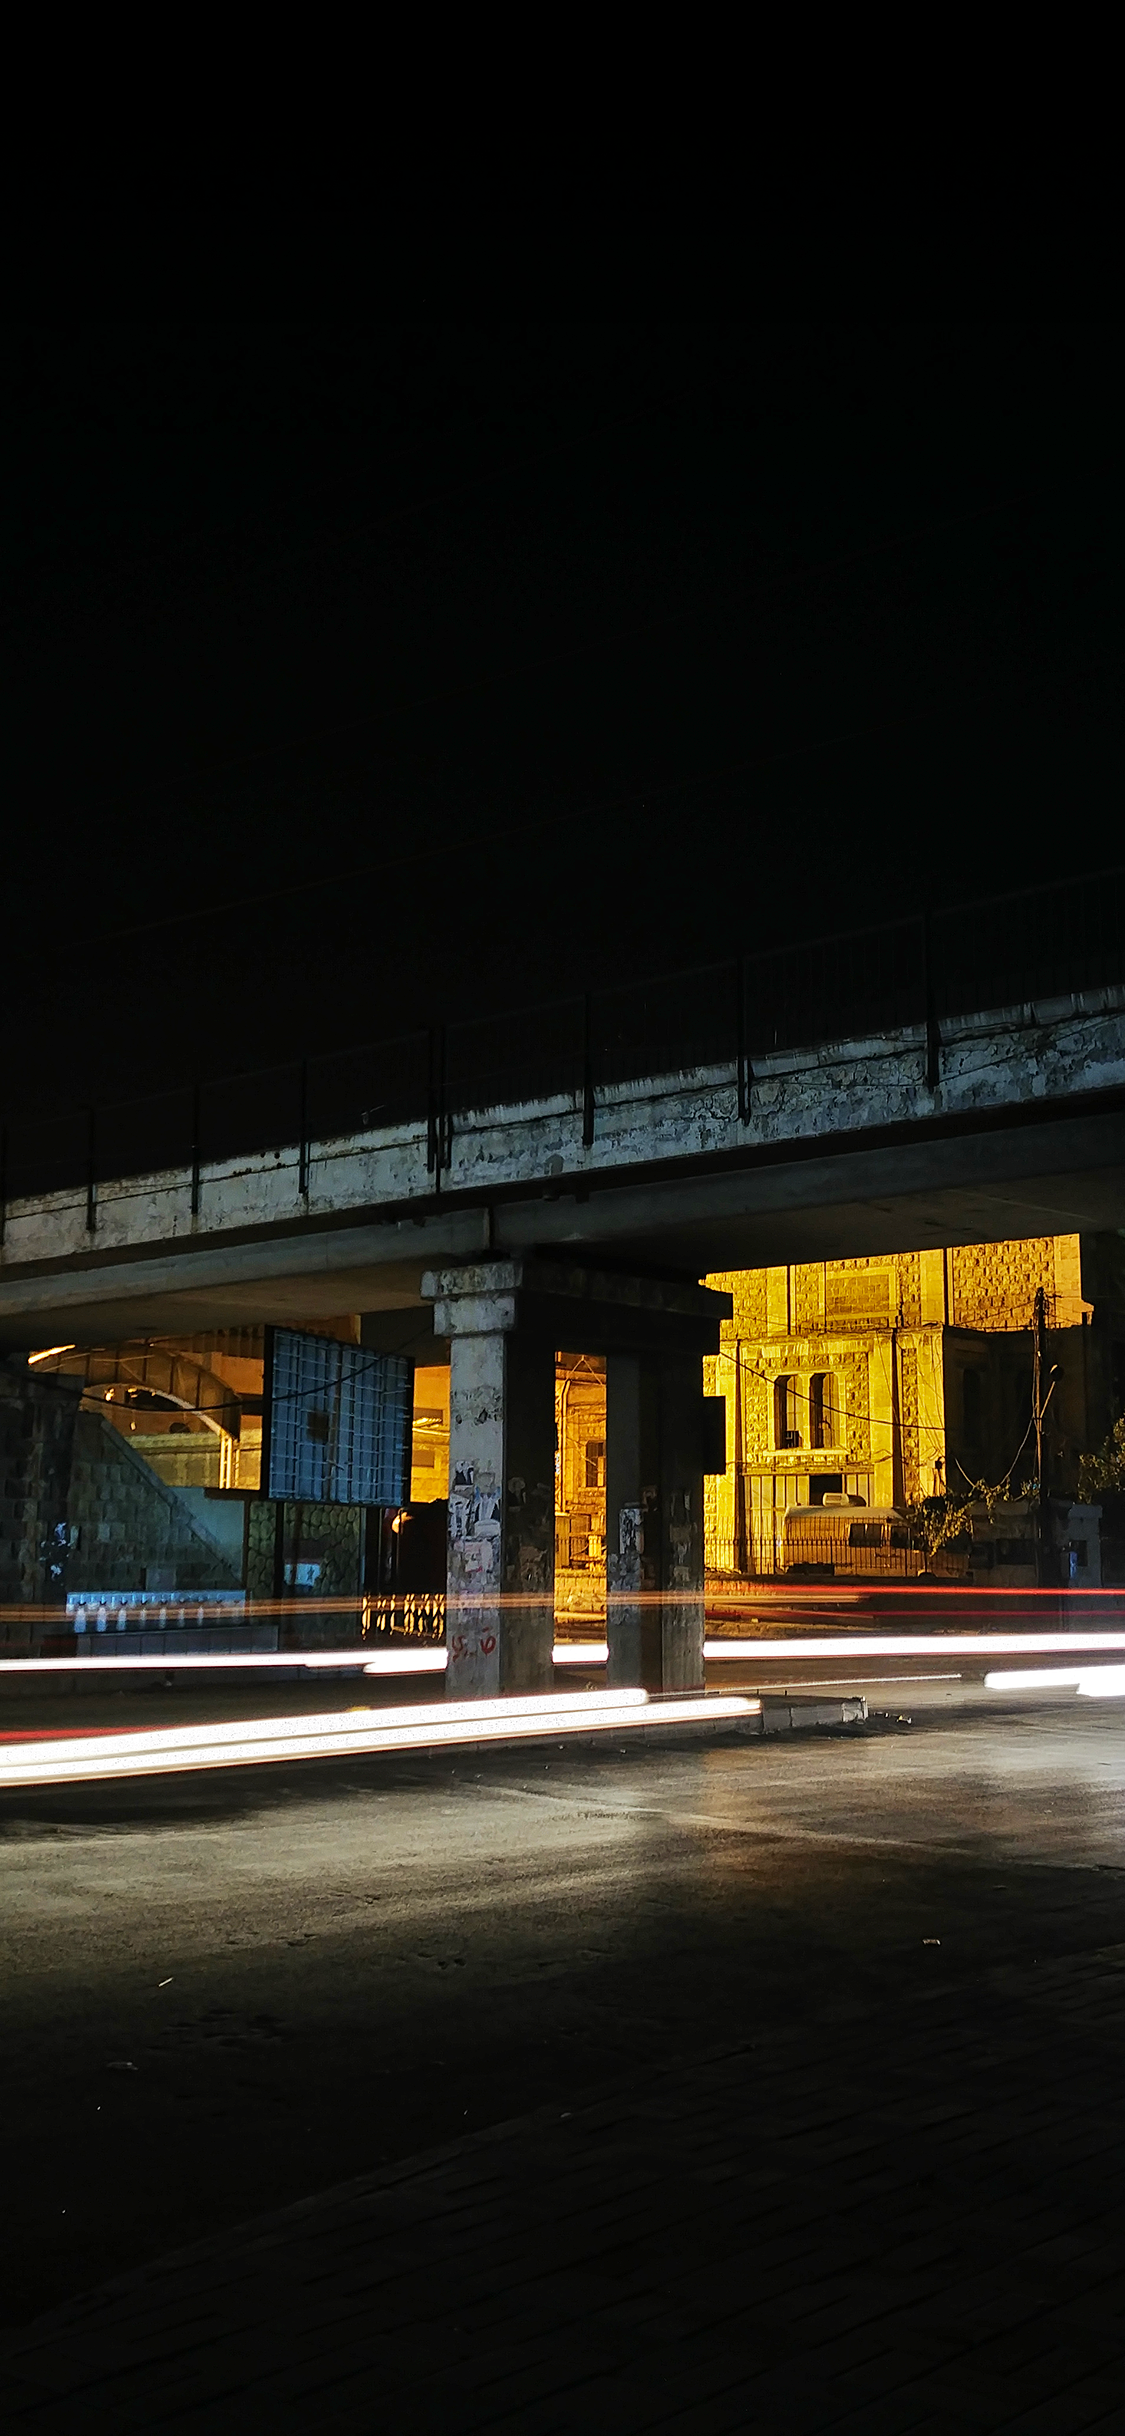 long exposure image bridge at night